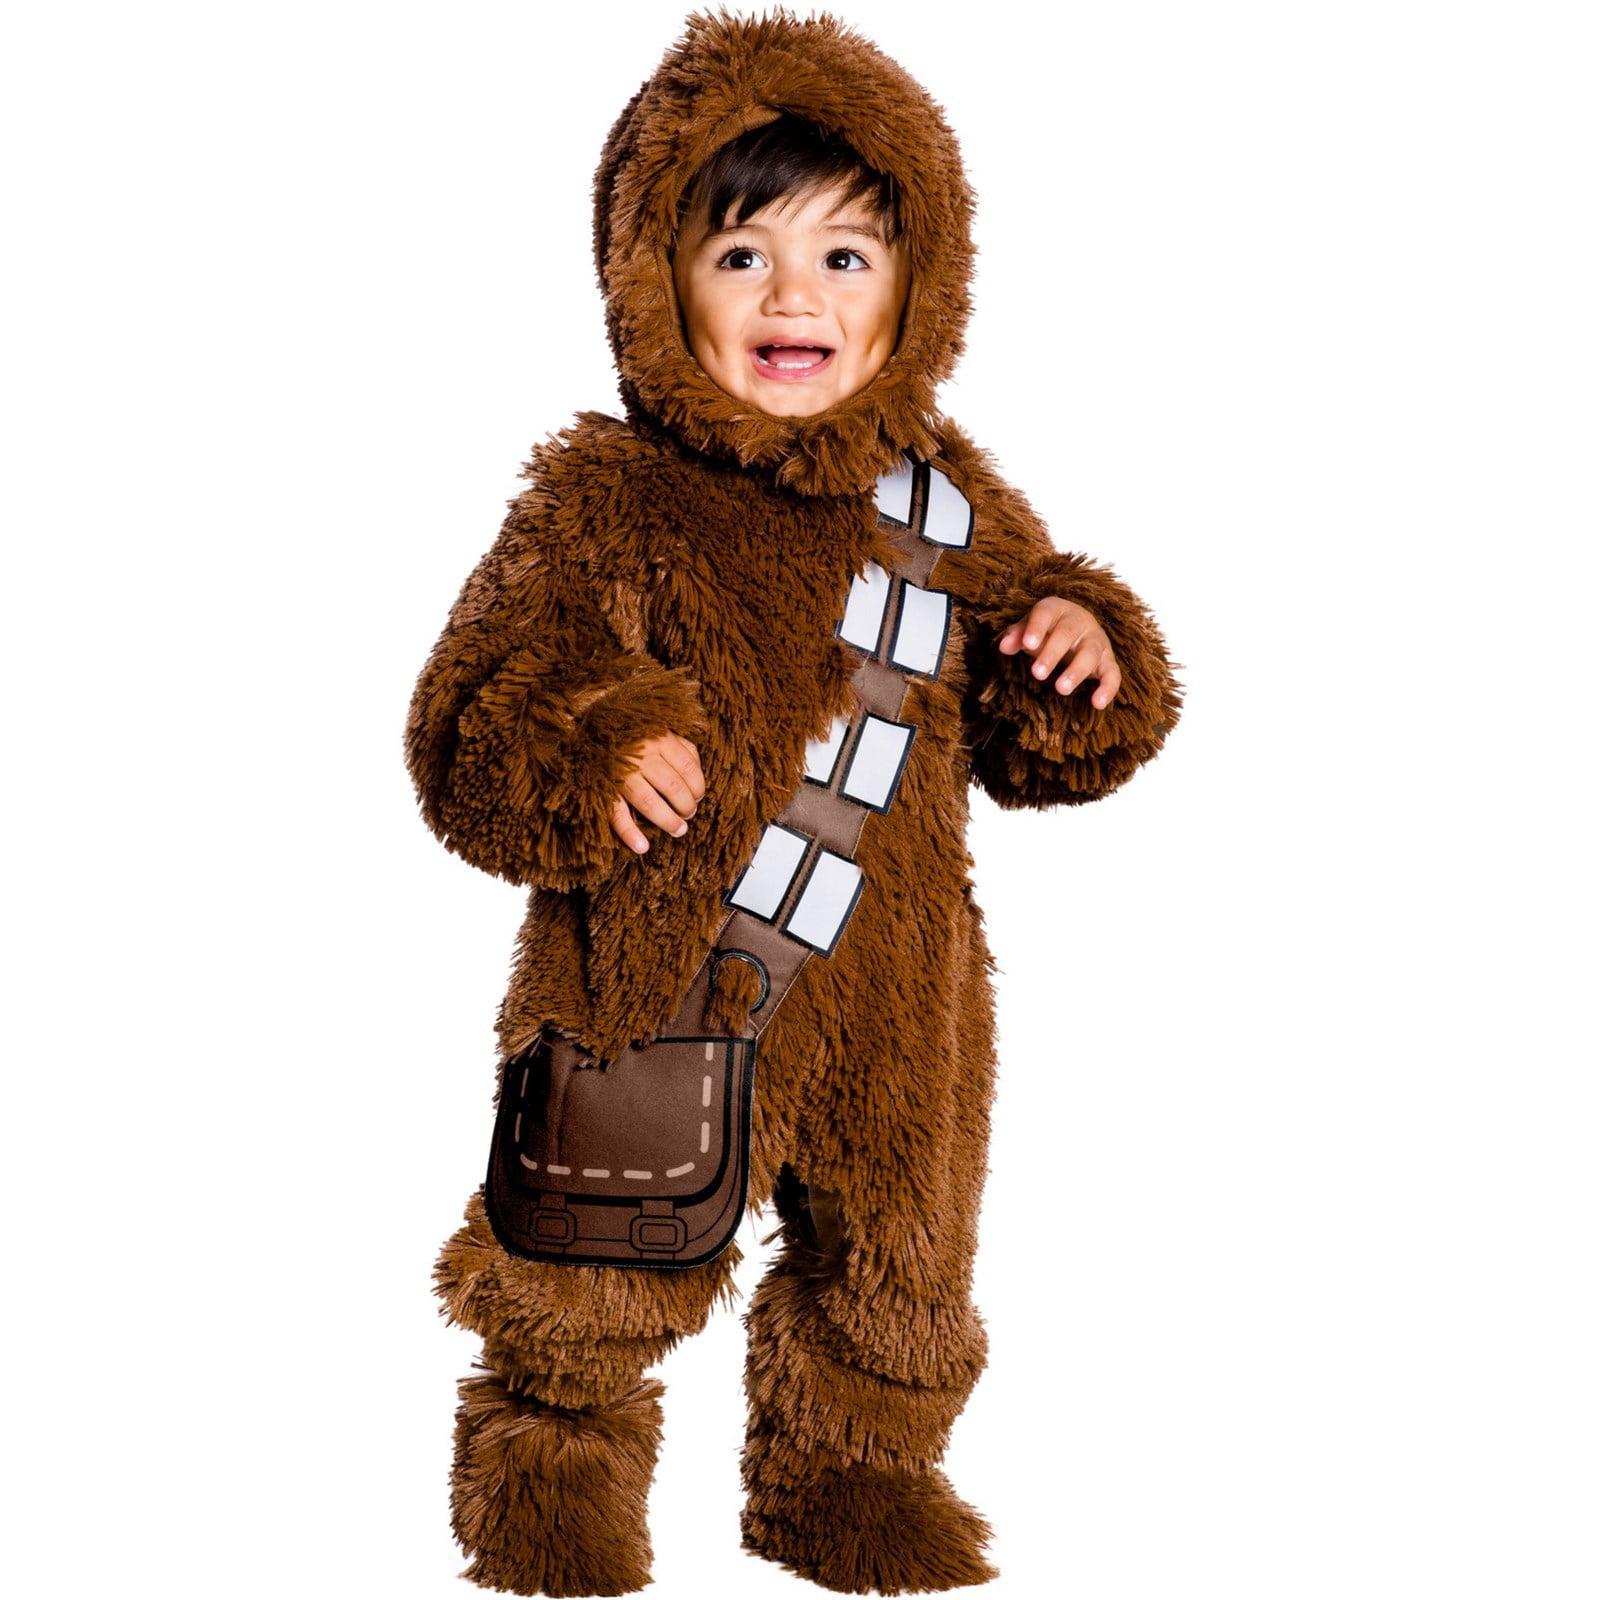 Classic Chewbacca Star Wars Costume for Women